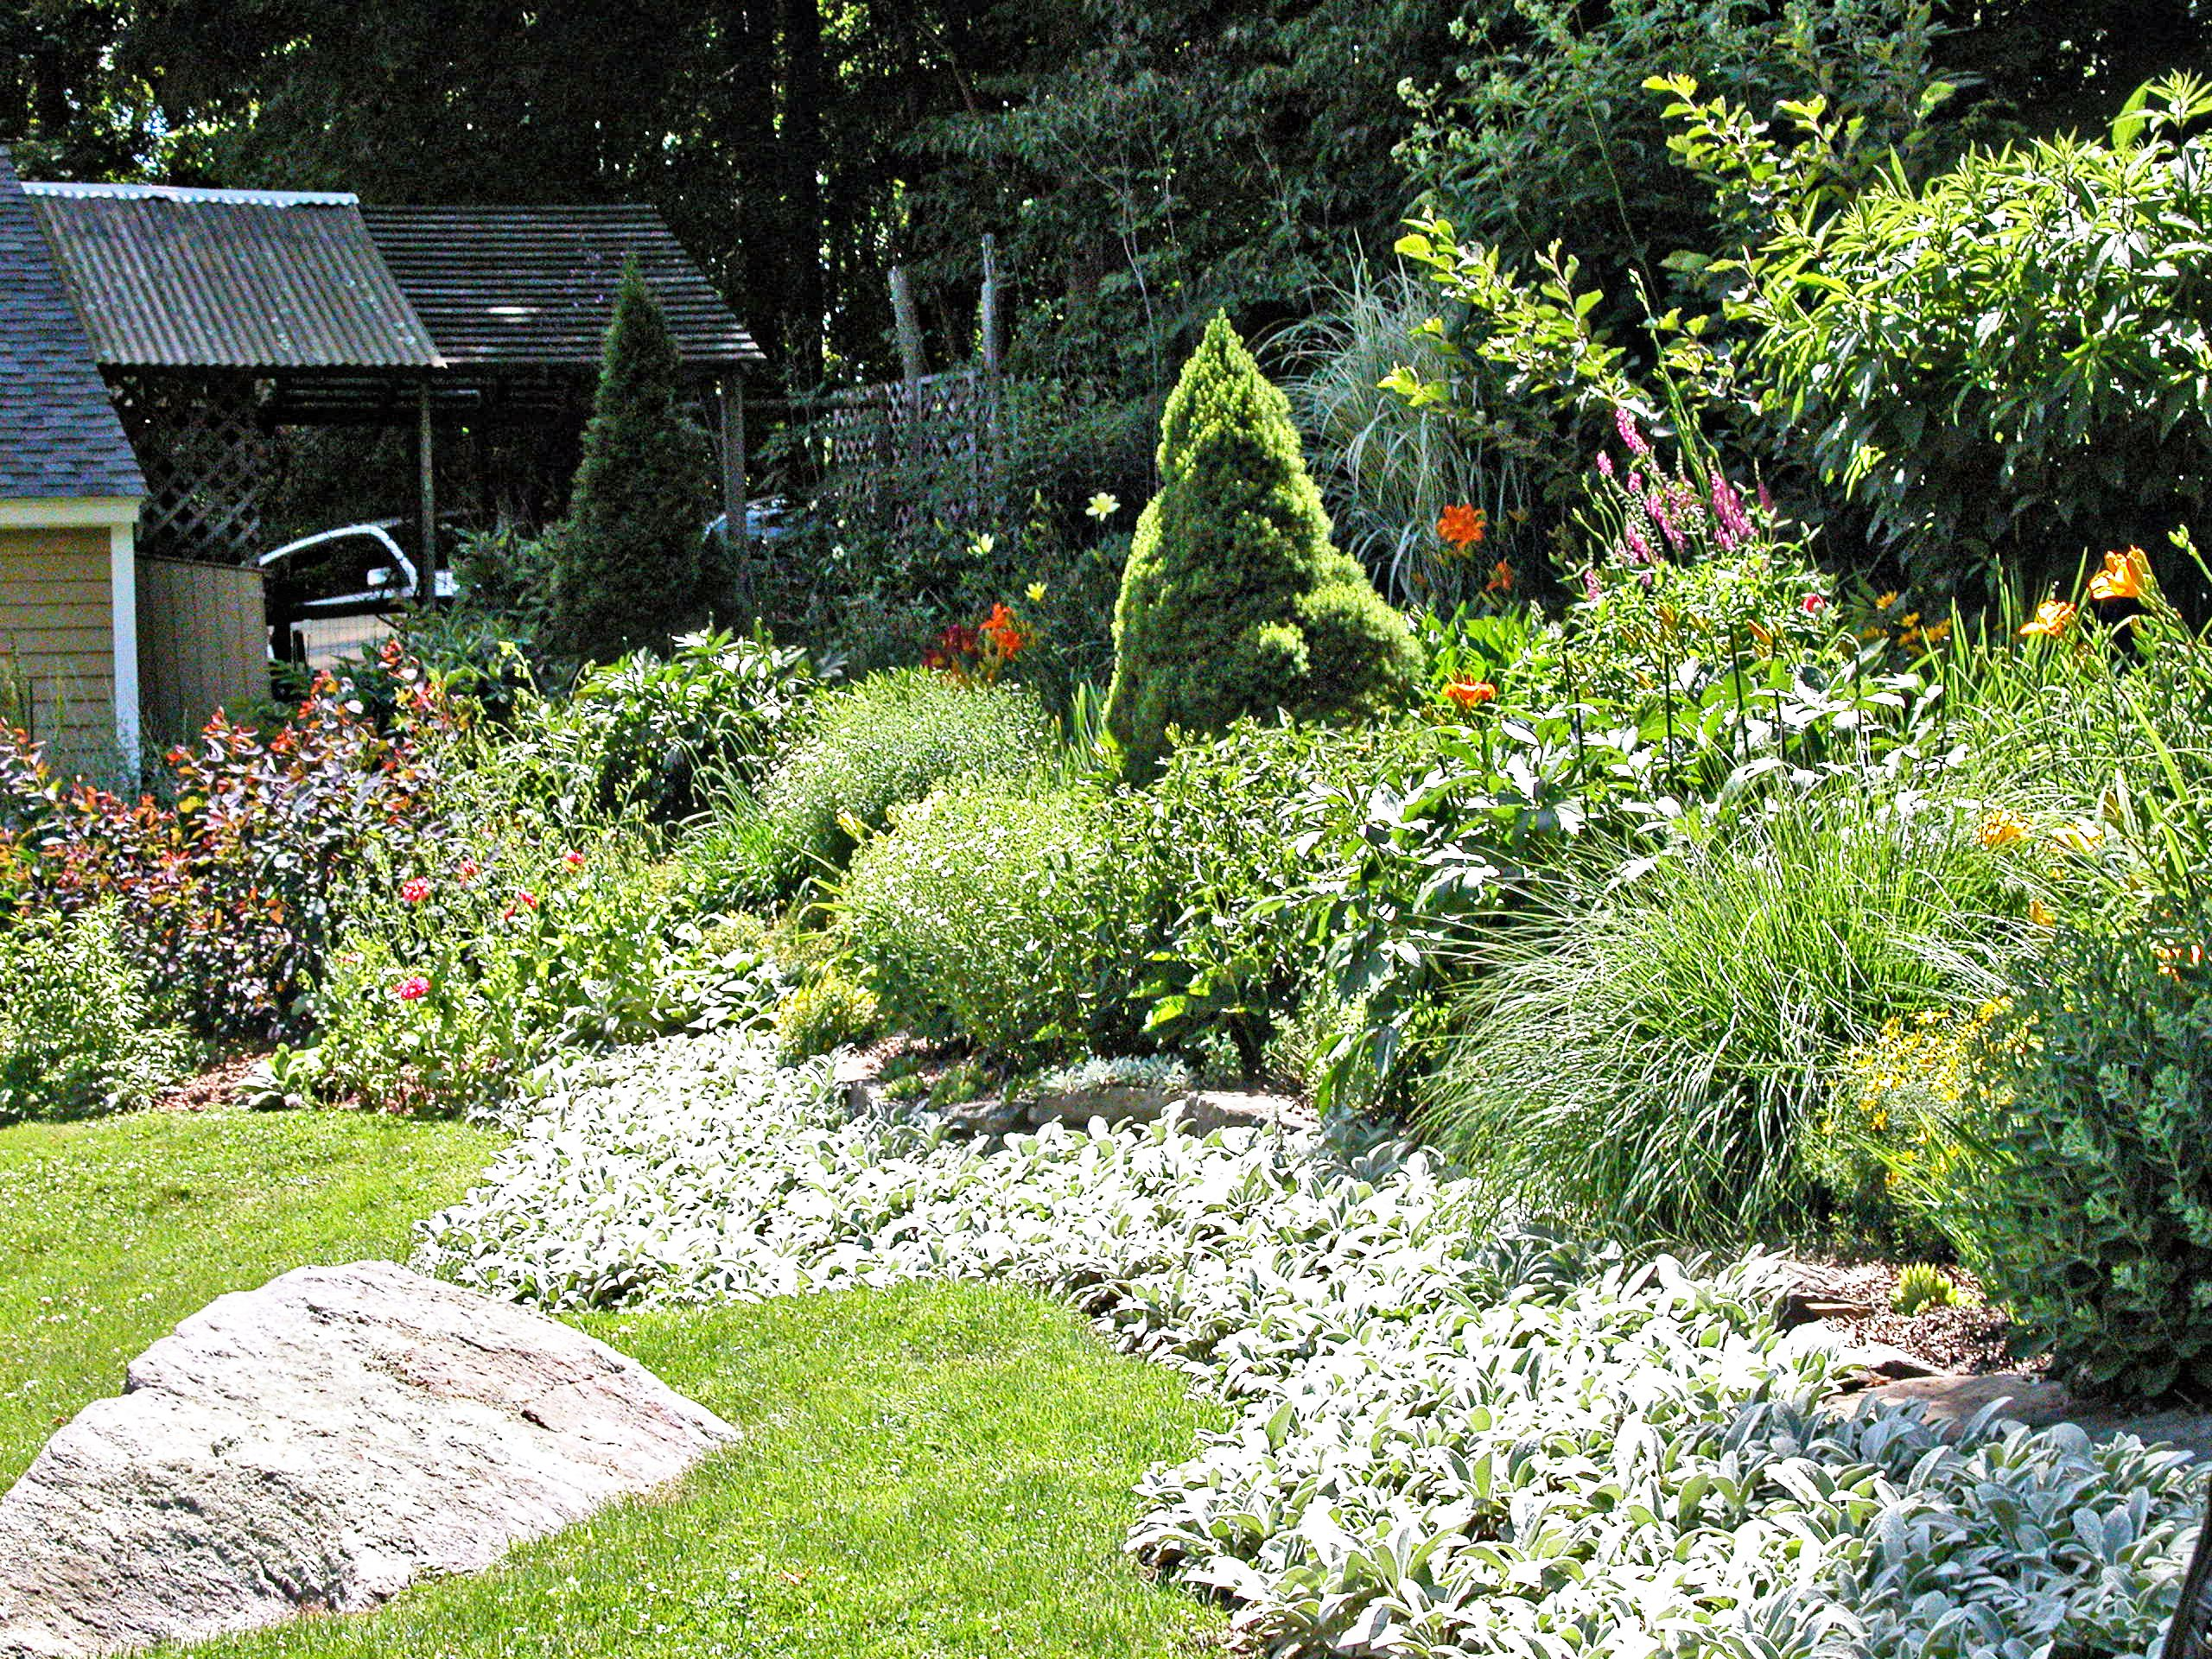 Five Easy Ways to Makeover an Overgrown Garden